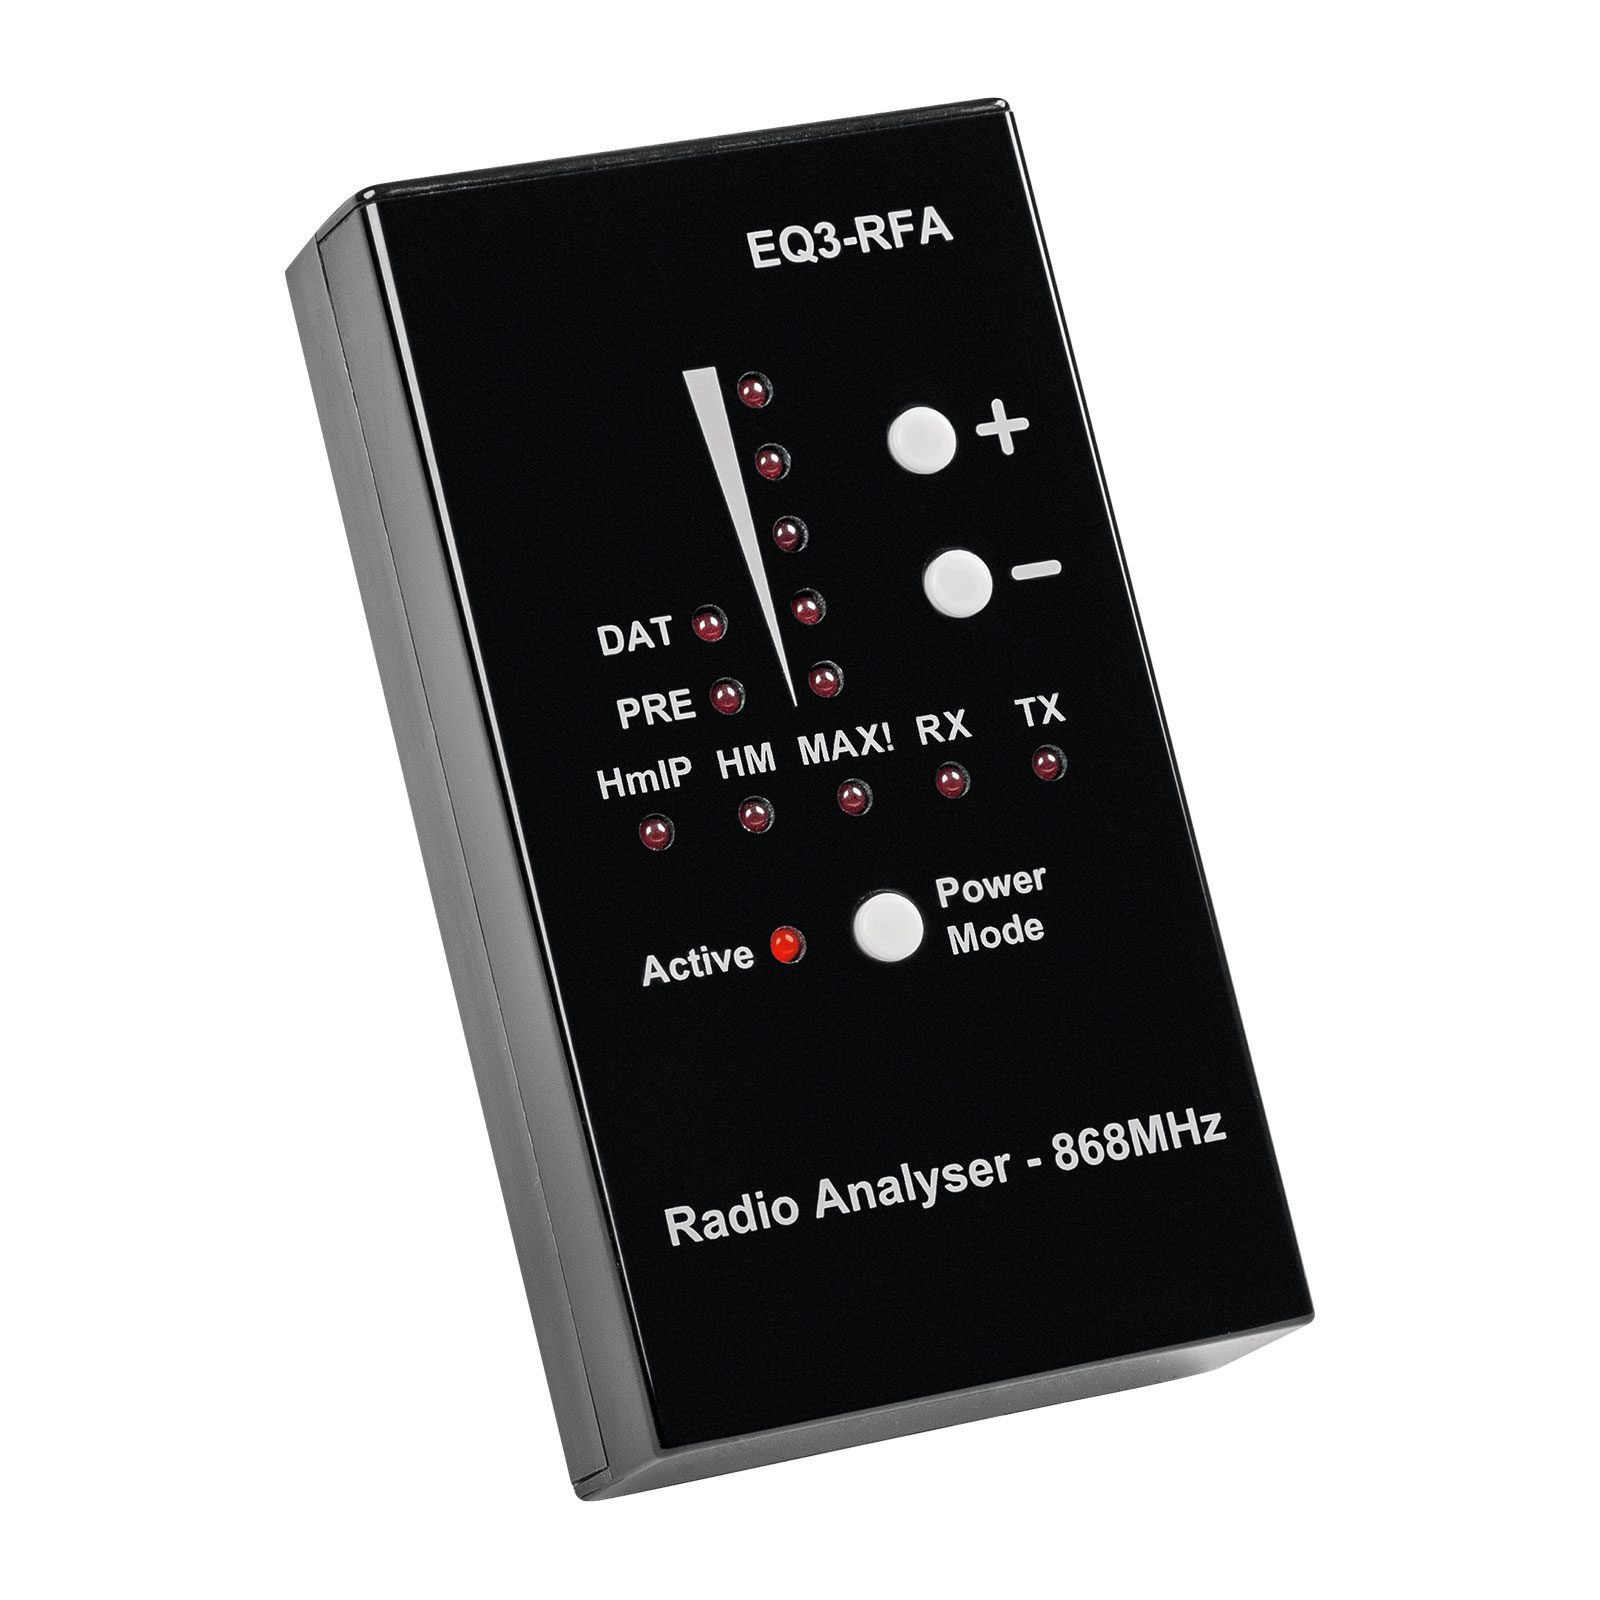 Homematic IP analyseur radio, 868MHz